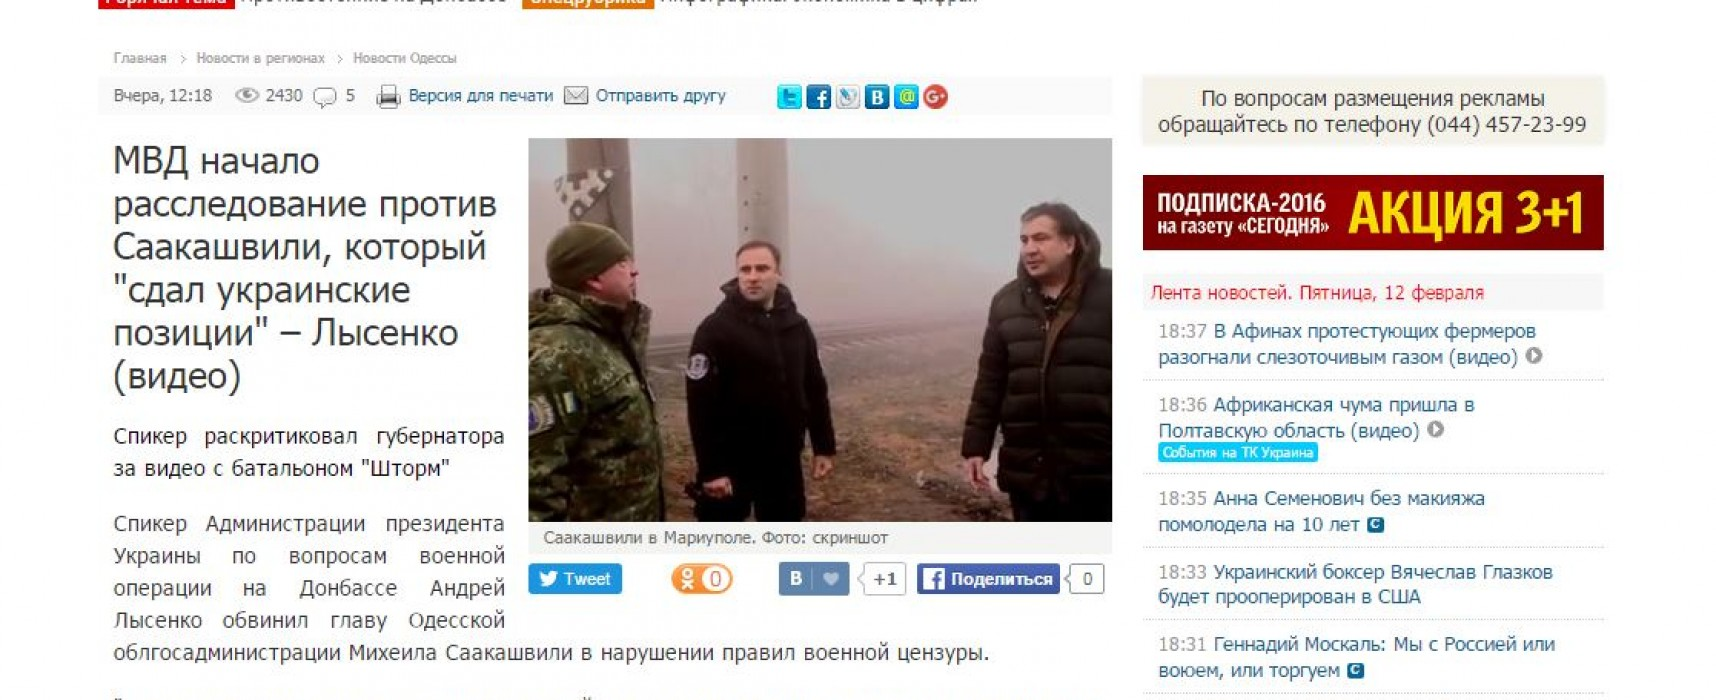 Fake : aperta inchiesta contro Saakashvili